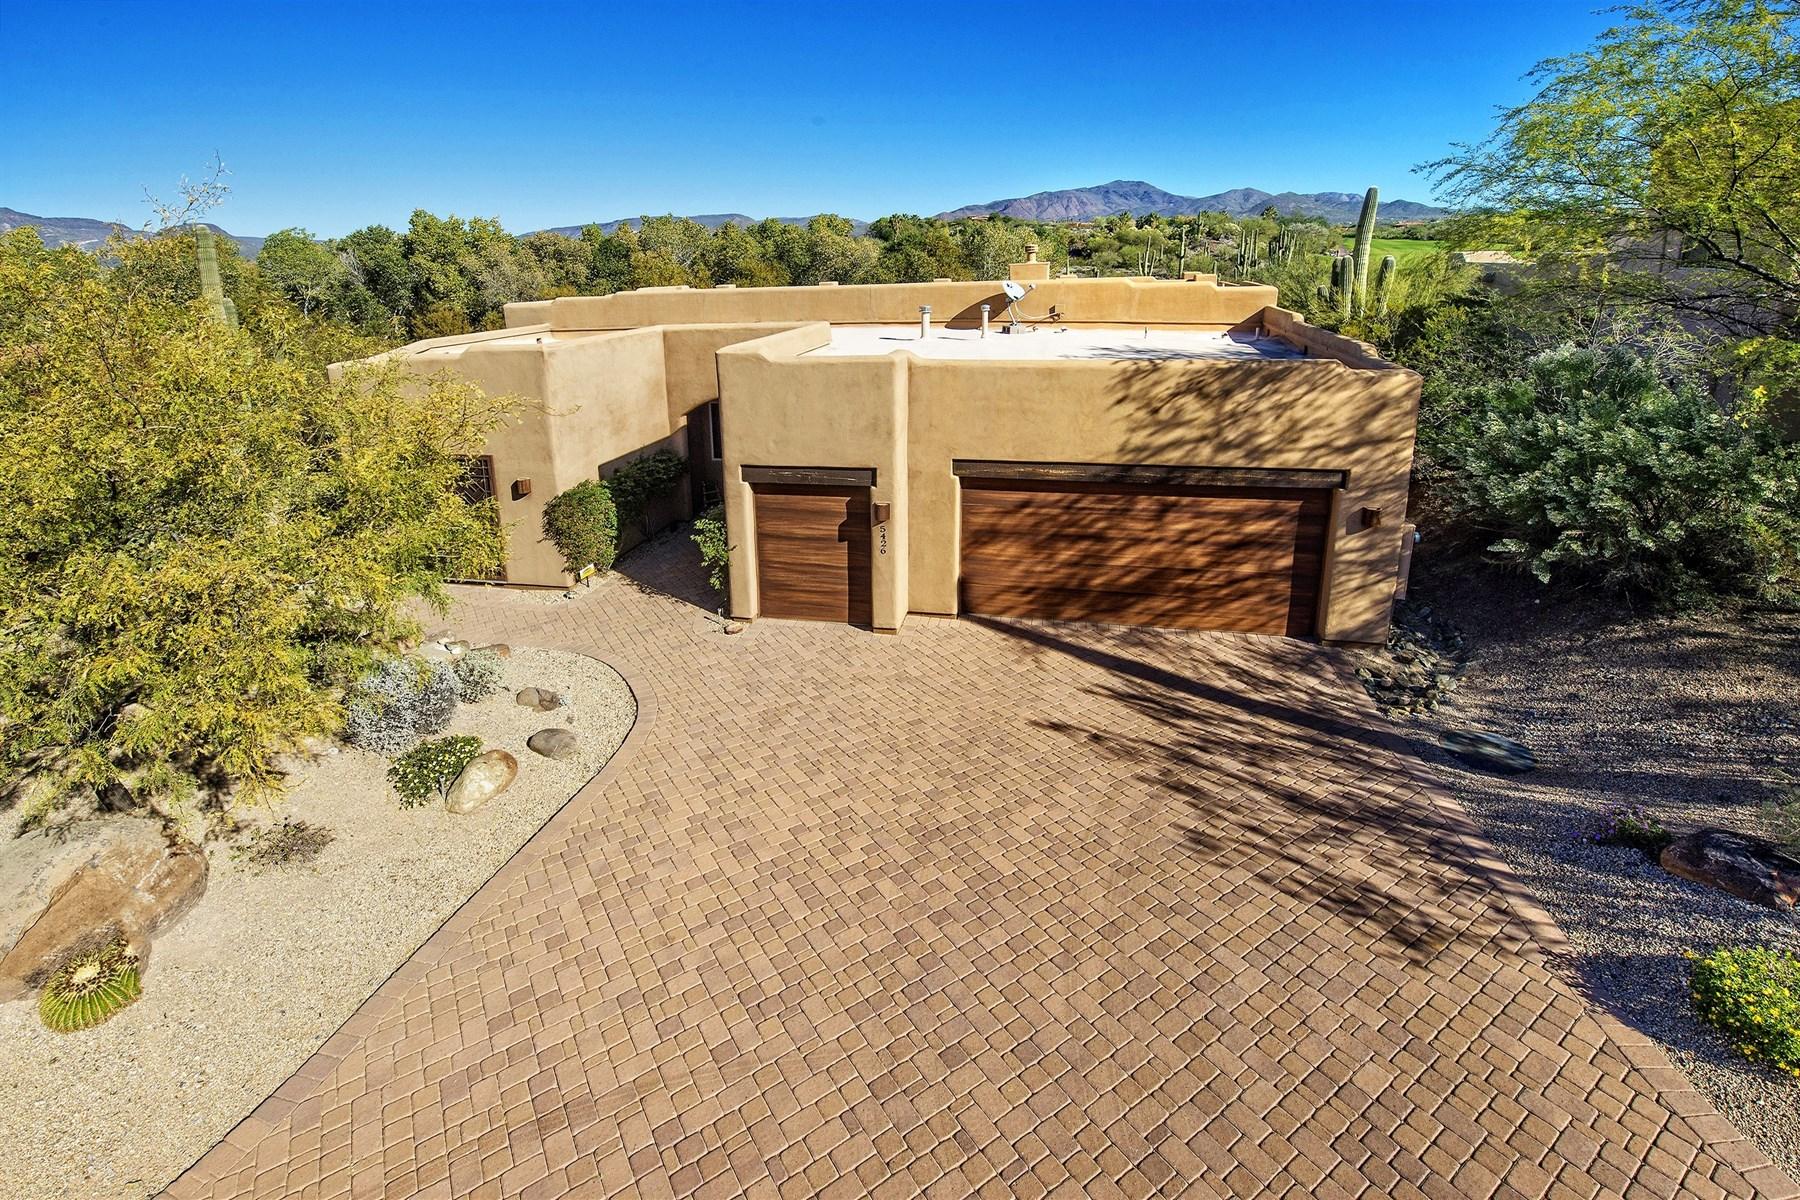 独户住宅 为 销售 在 Custom home on the golf course at Rancho Manana 5426 E Miramonte Dr 凯夫克里克, 亚利桑那州 85331 美国